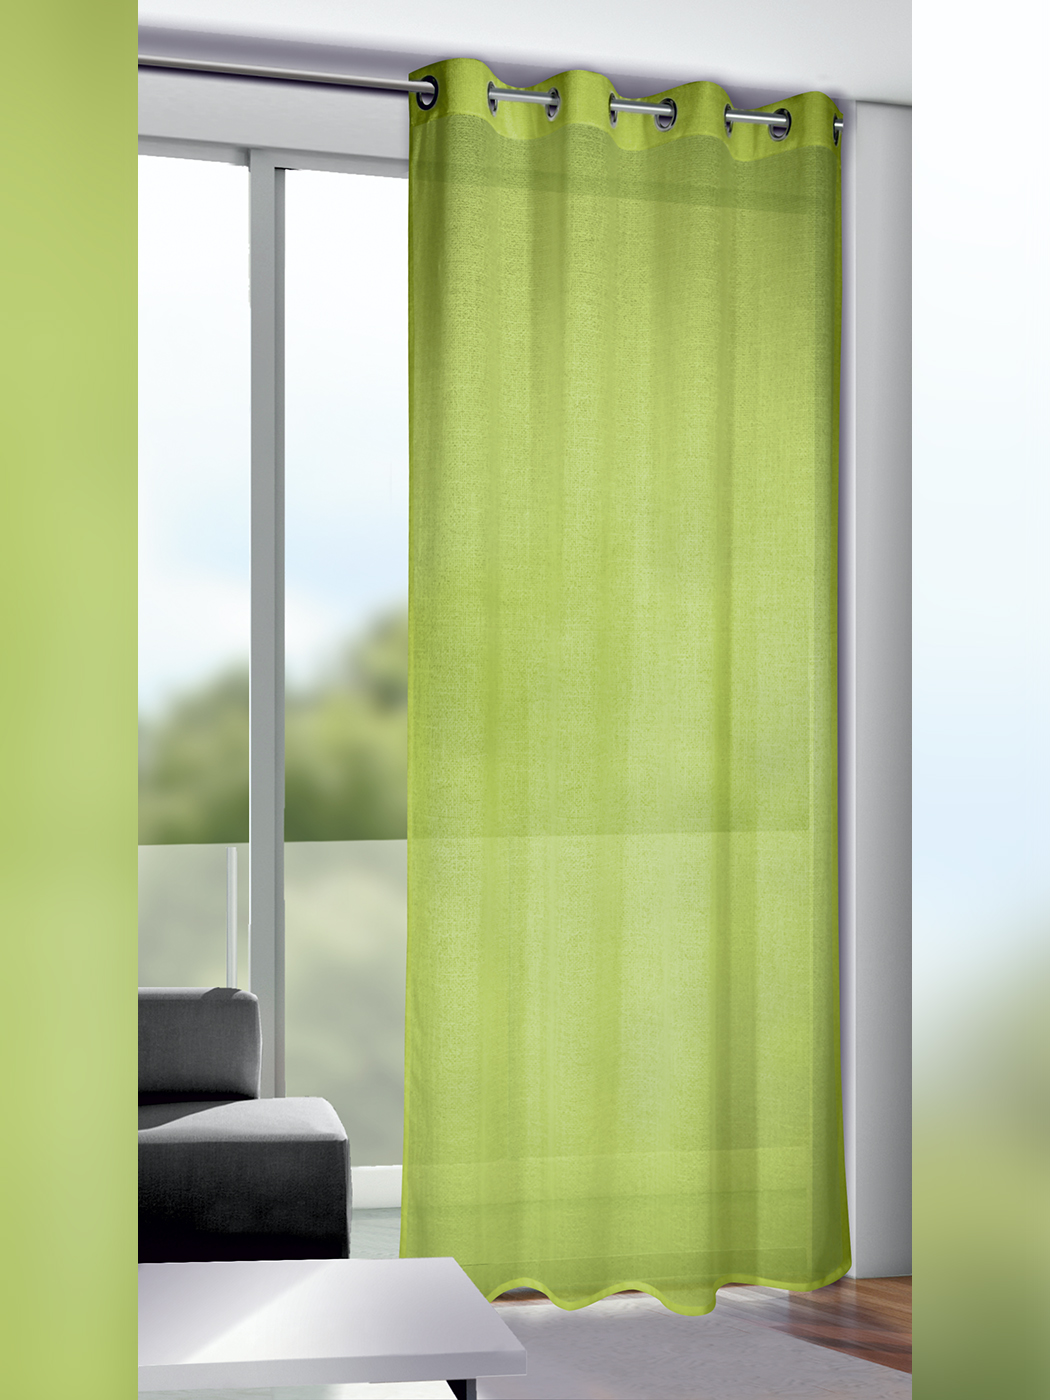 Neusser Collection Ösenschal Gerome 135 x 245 cm grün